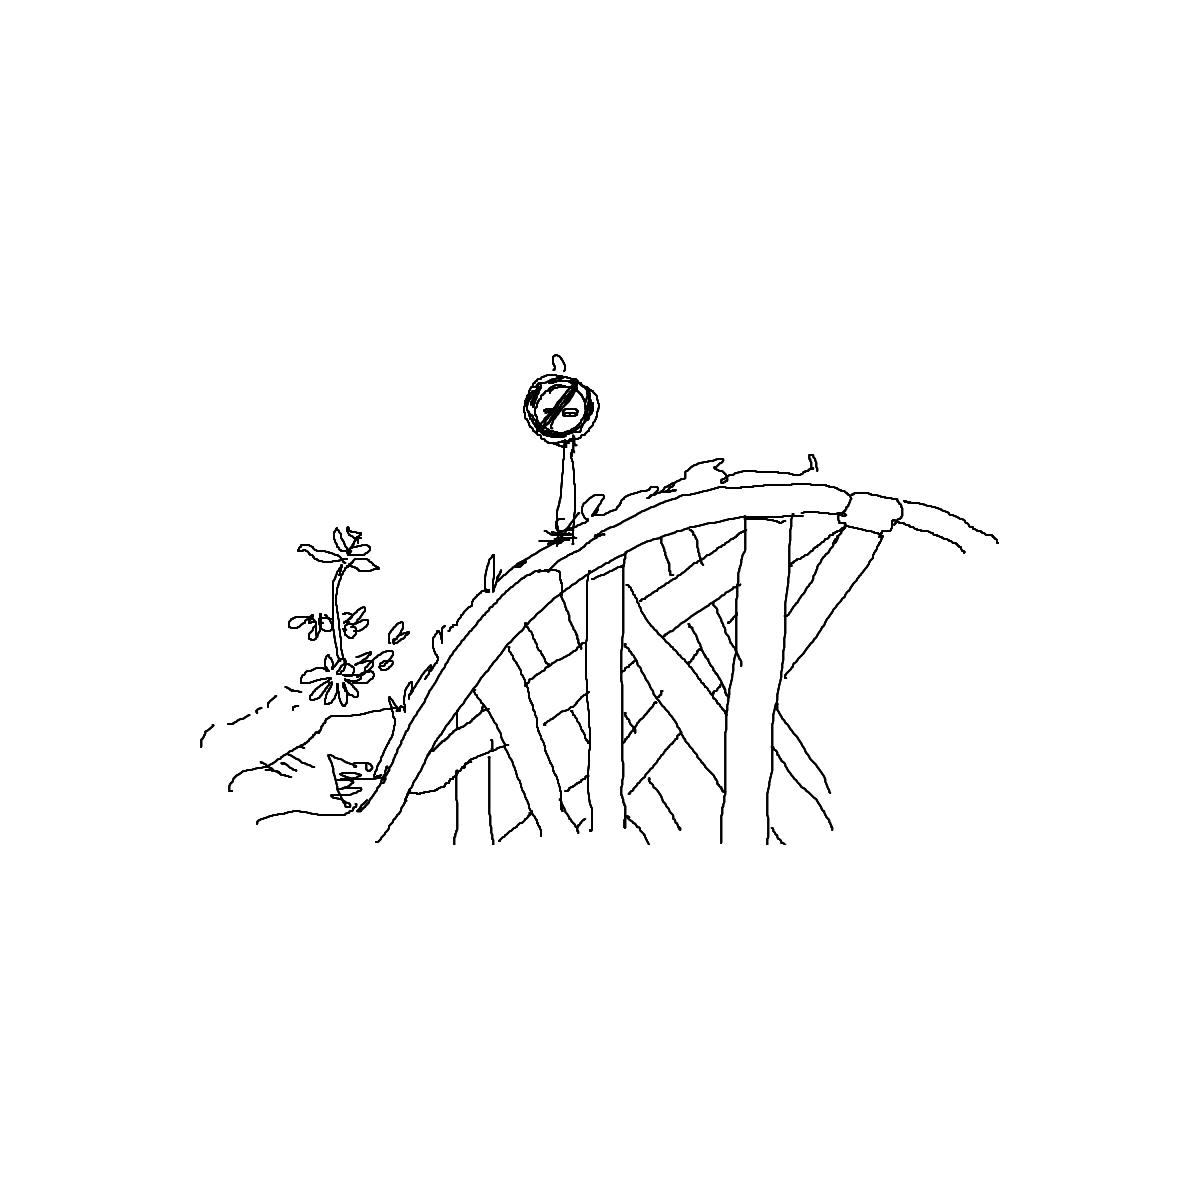 BAAAM drawing#22265 lat:78.4174728393554700lng: -4.4291005134582520